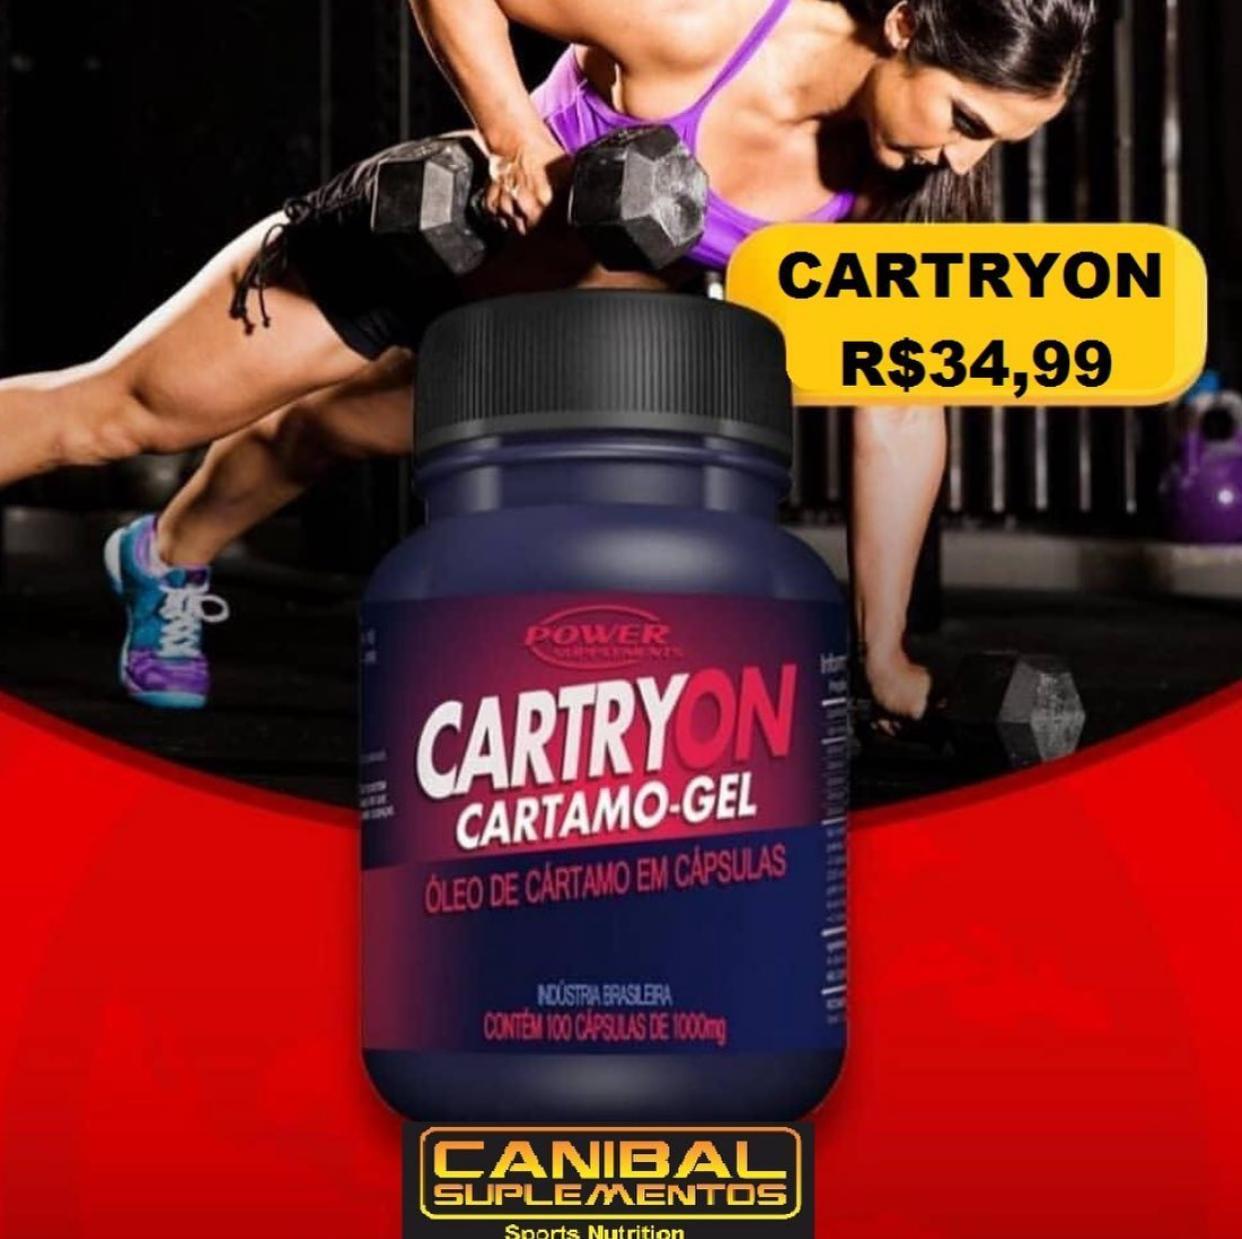 CARTRYON CARTAMO GEL POWER SUPLEMENTOS 100CAPS